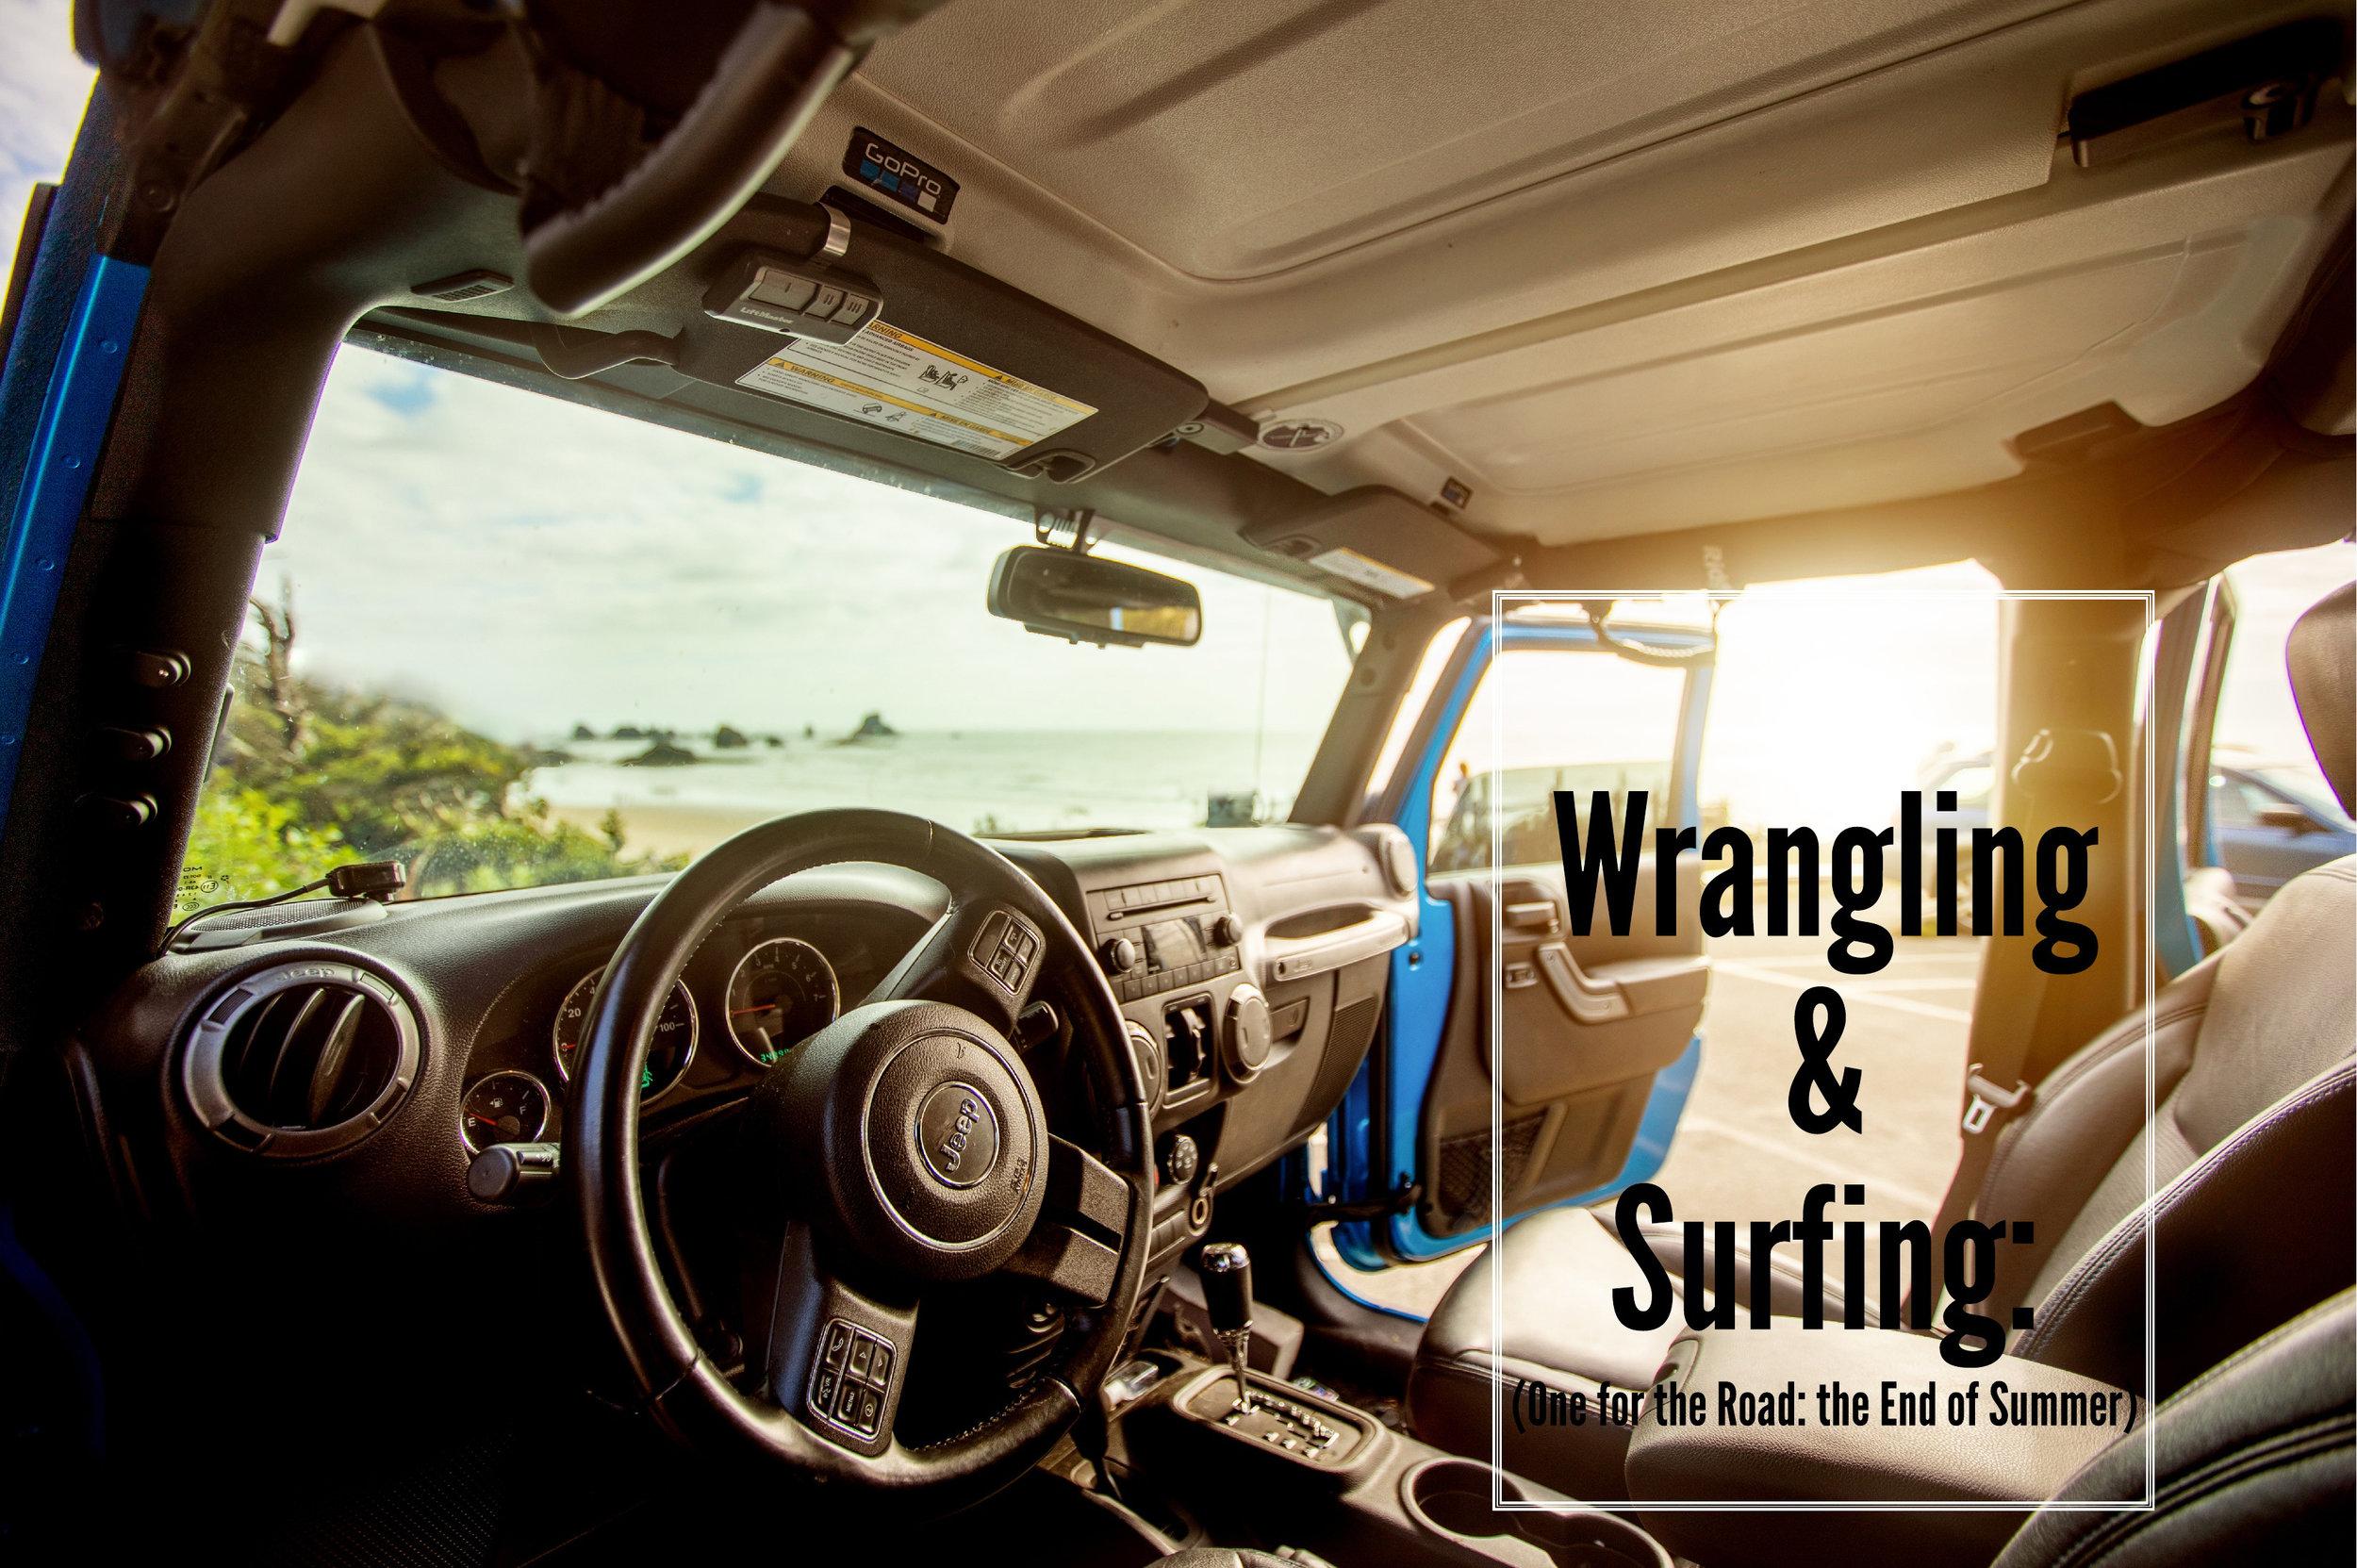 Wrangle & Surf - Untitled Page.jpeg.jpg